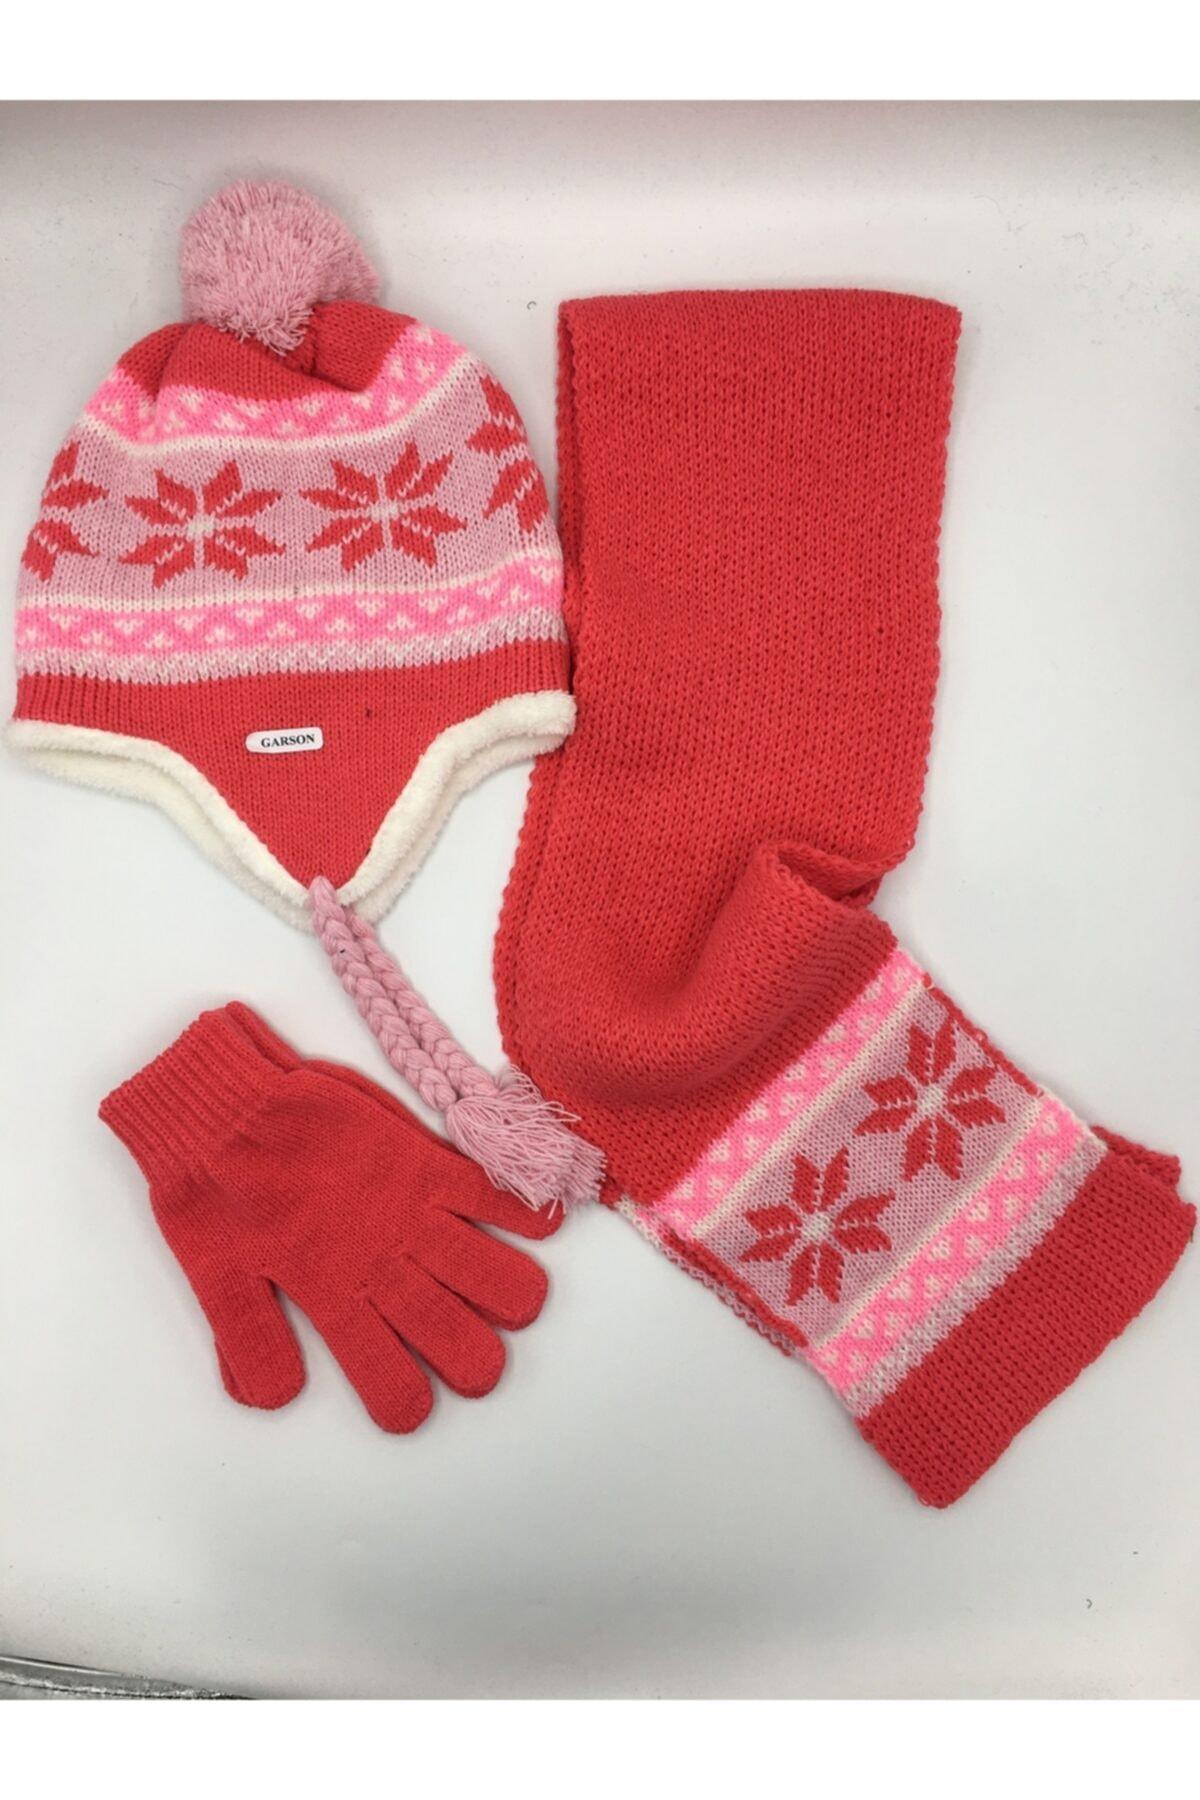 GONCA ŞAPKA Kız Çocuk Atkı-bere-eldiven Seti 1